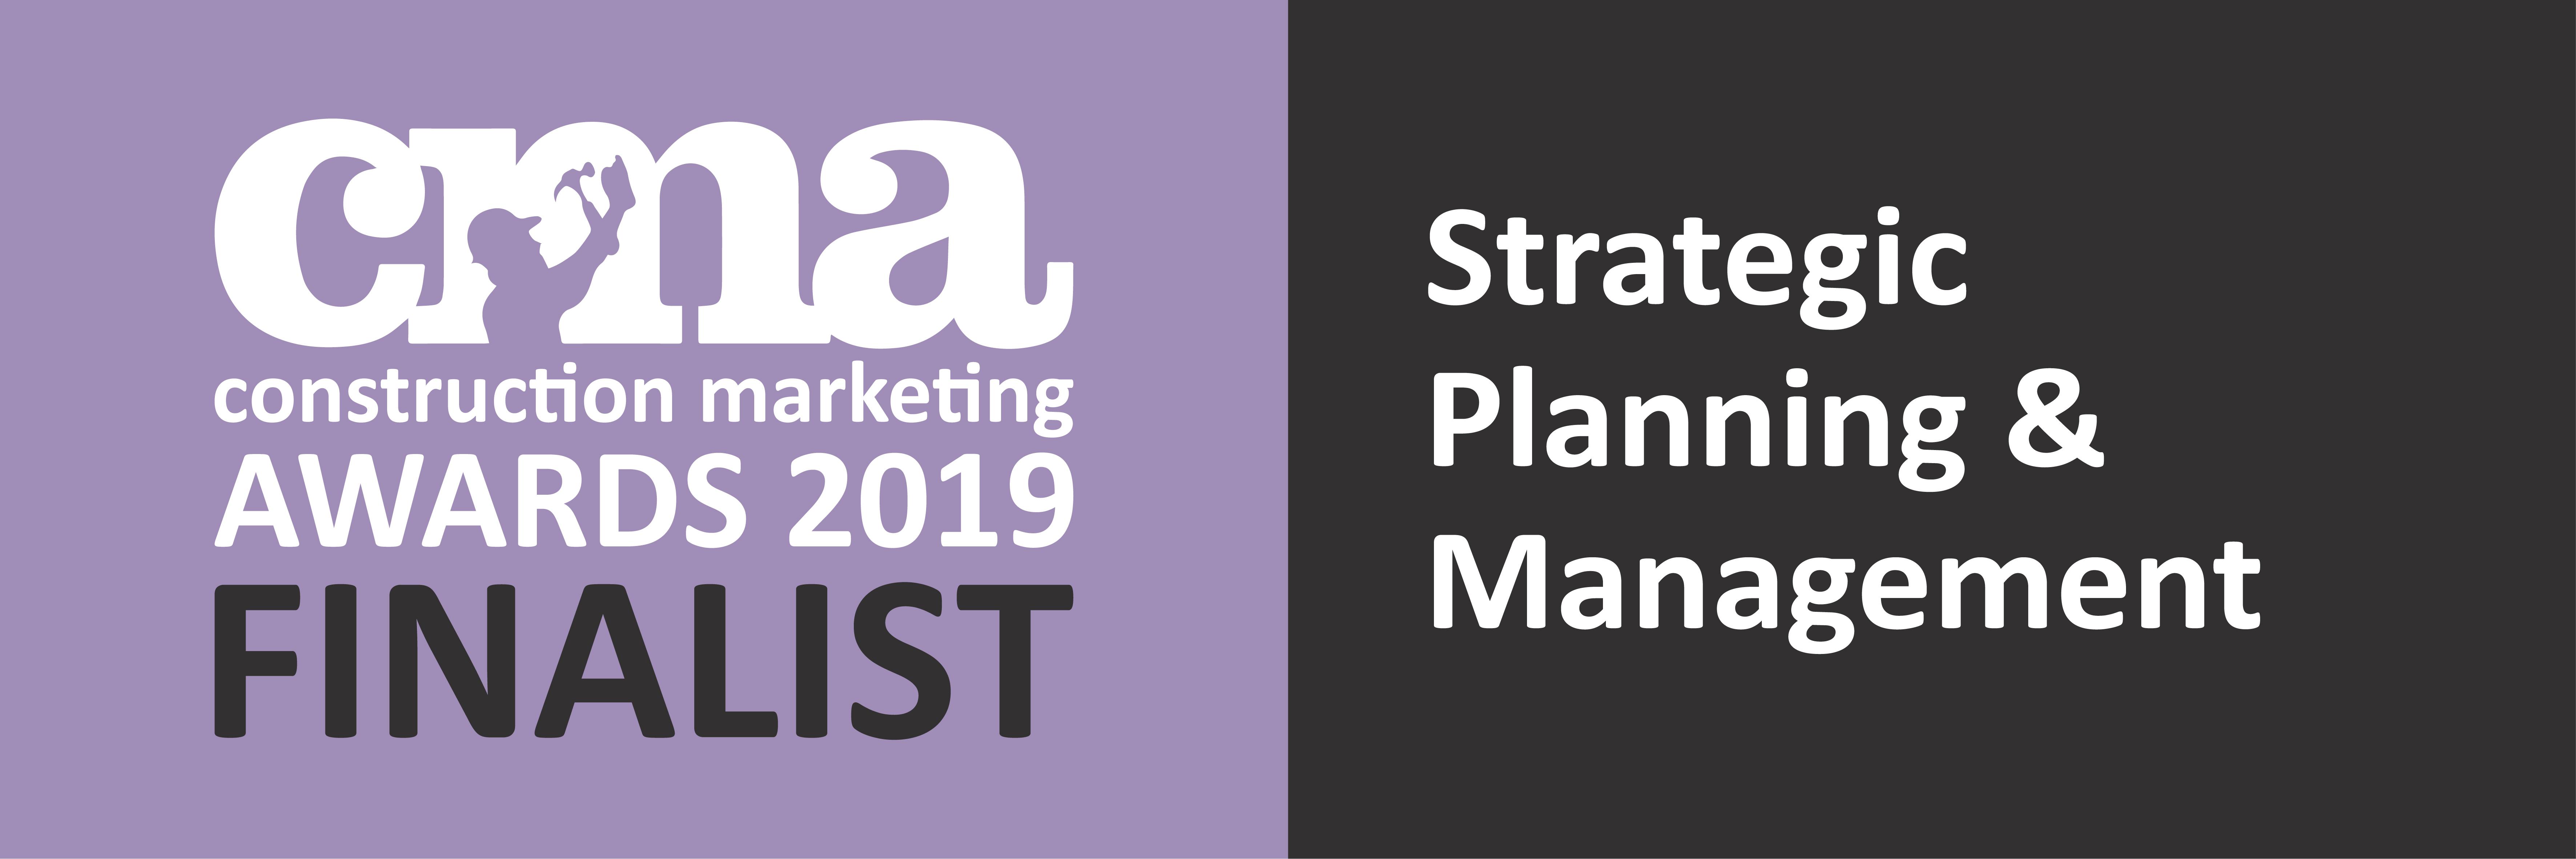 CMA-2019-Finalist-Strategic-Planning-&-Management-OL